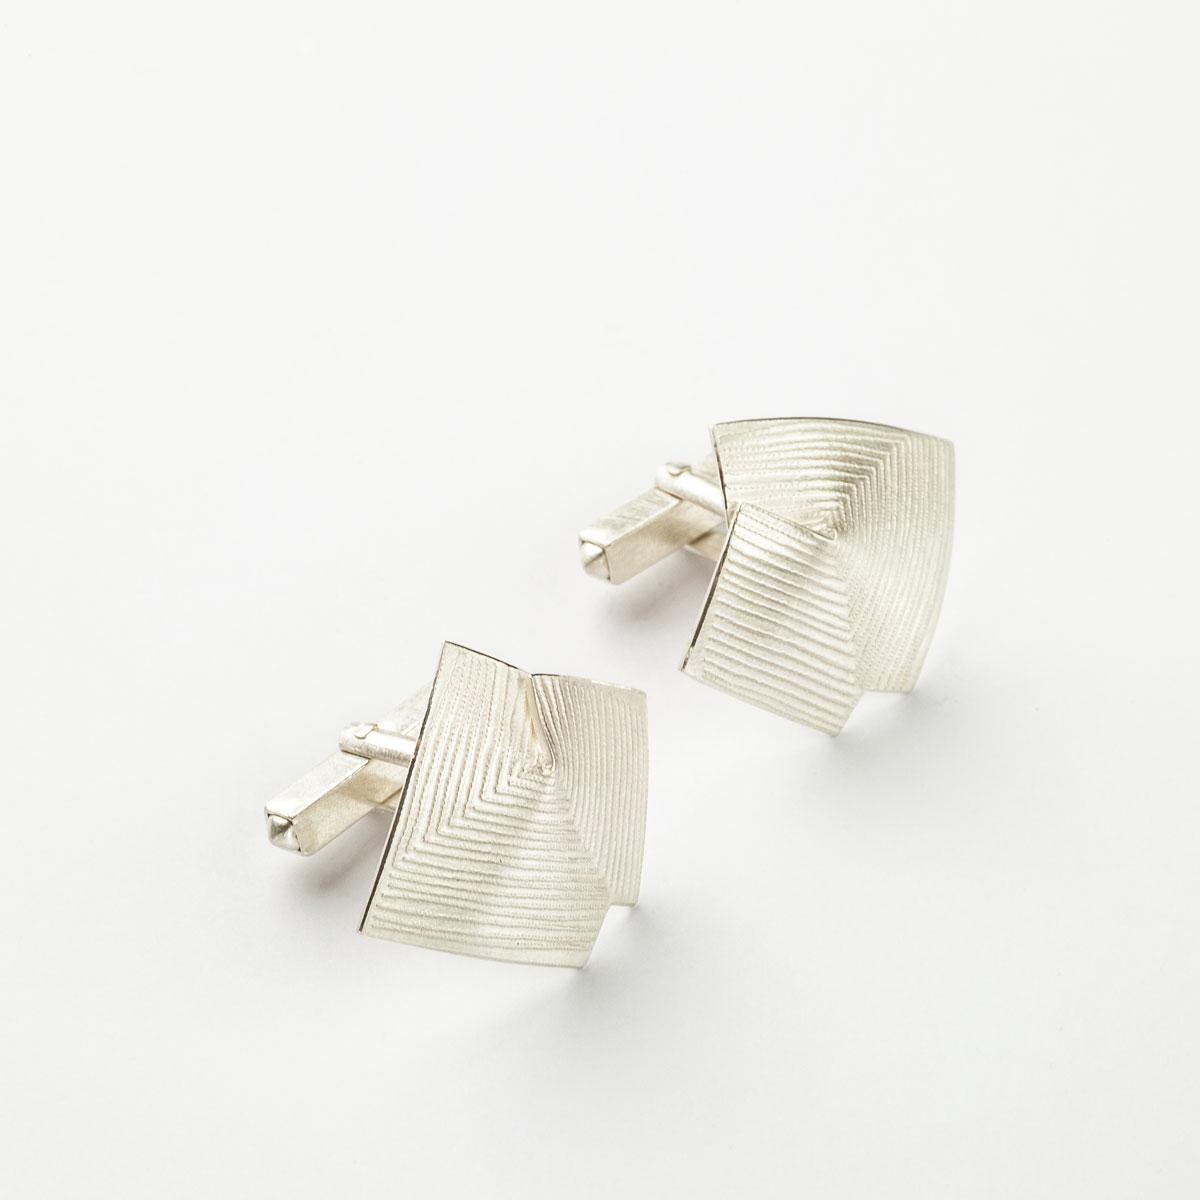 'Lines in Motion' Silver Cufflinks